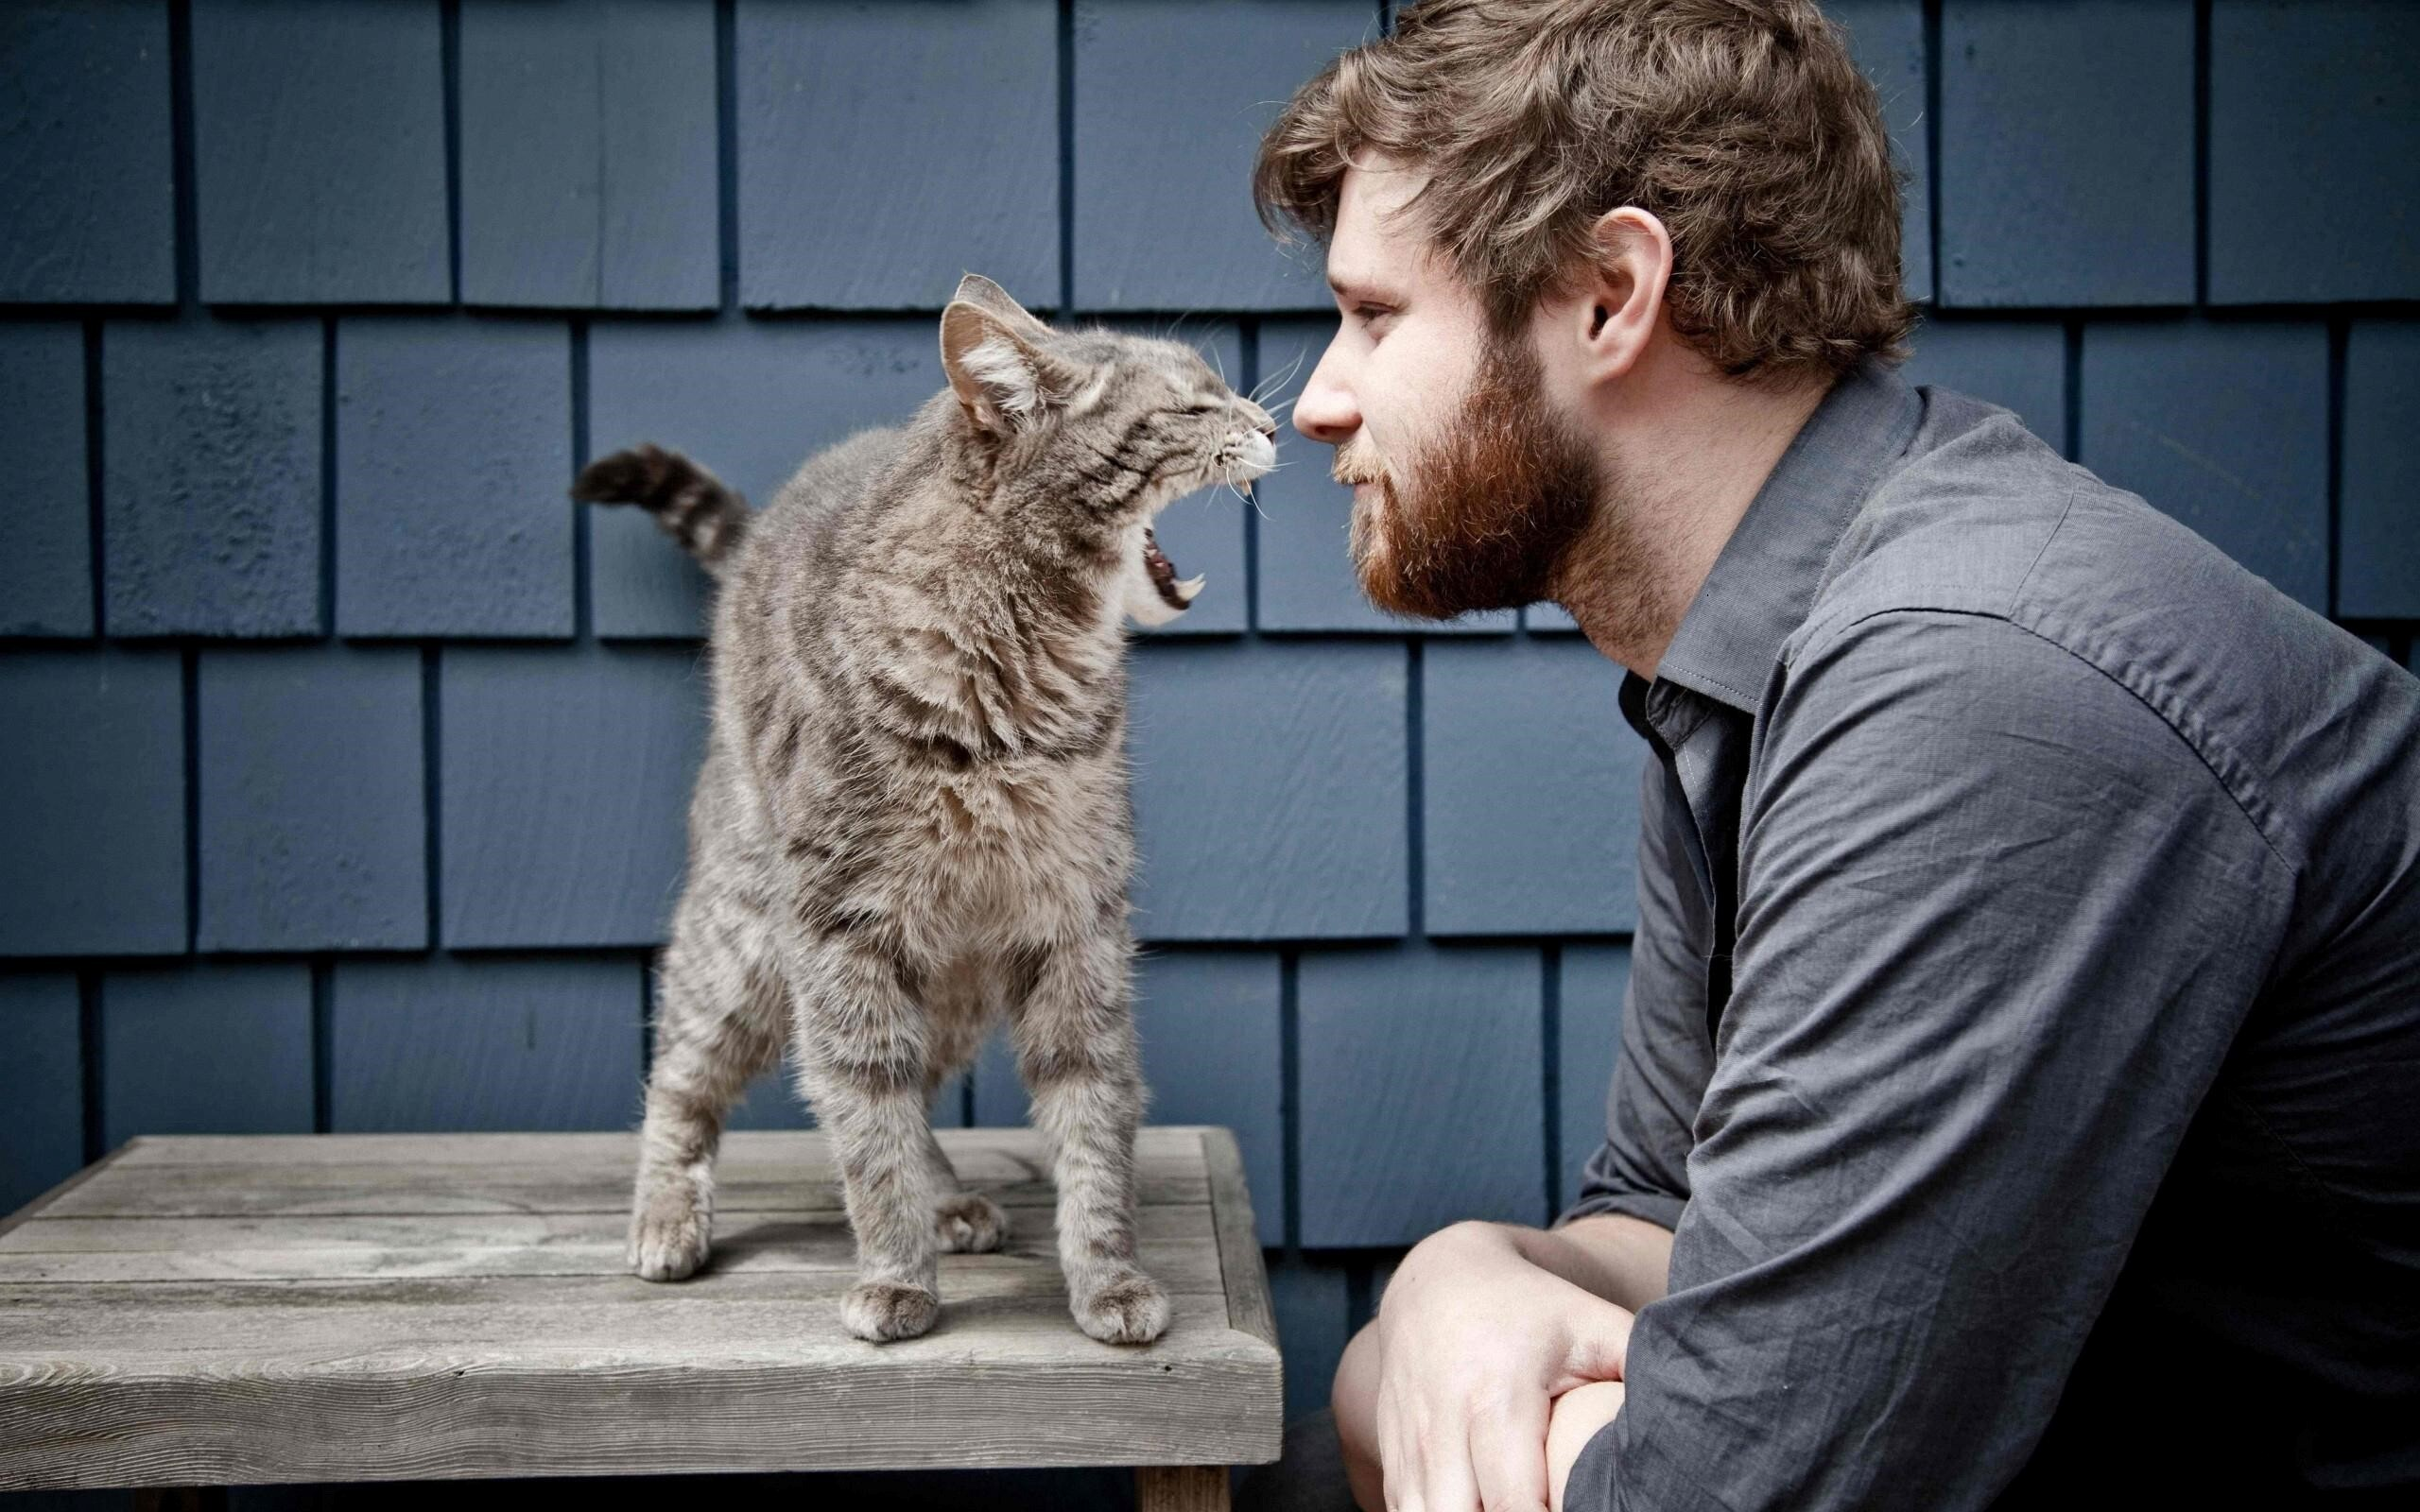 Funny Cat Vs Man Wallpaper Hd Wallpapers